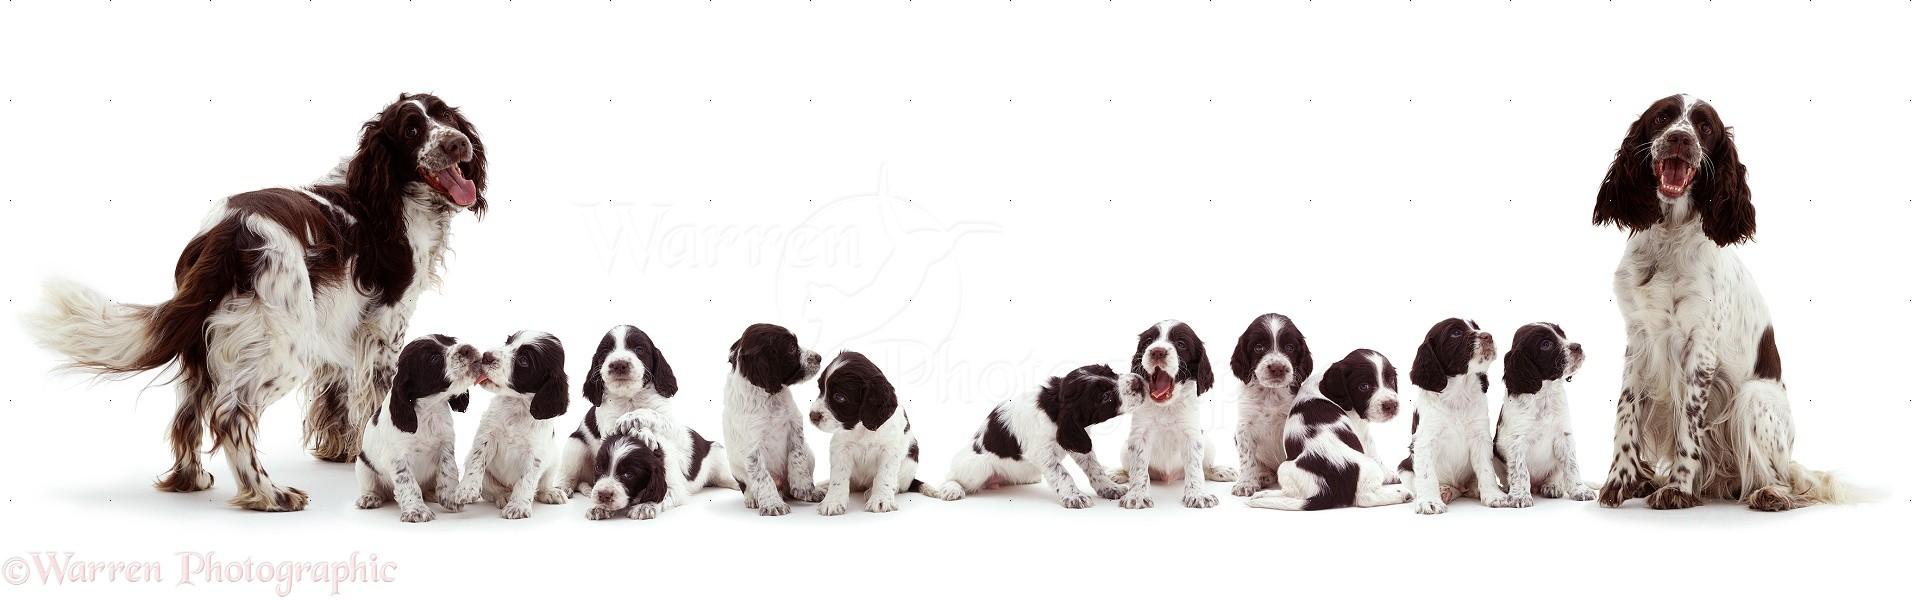 English Water Spaniel Puppies: English English Springer Spaniel Family Breed